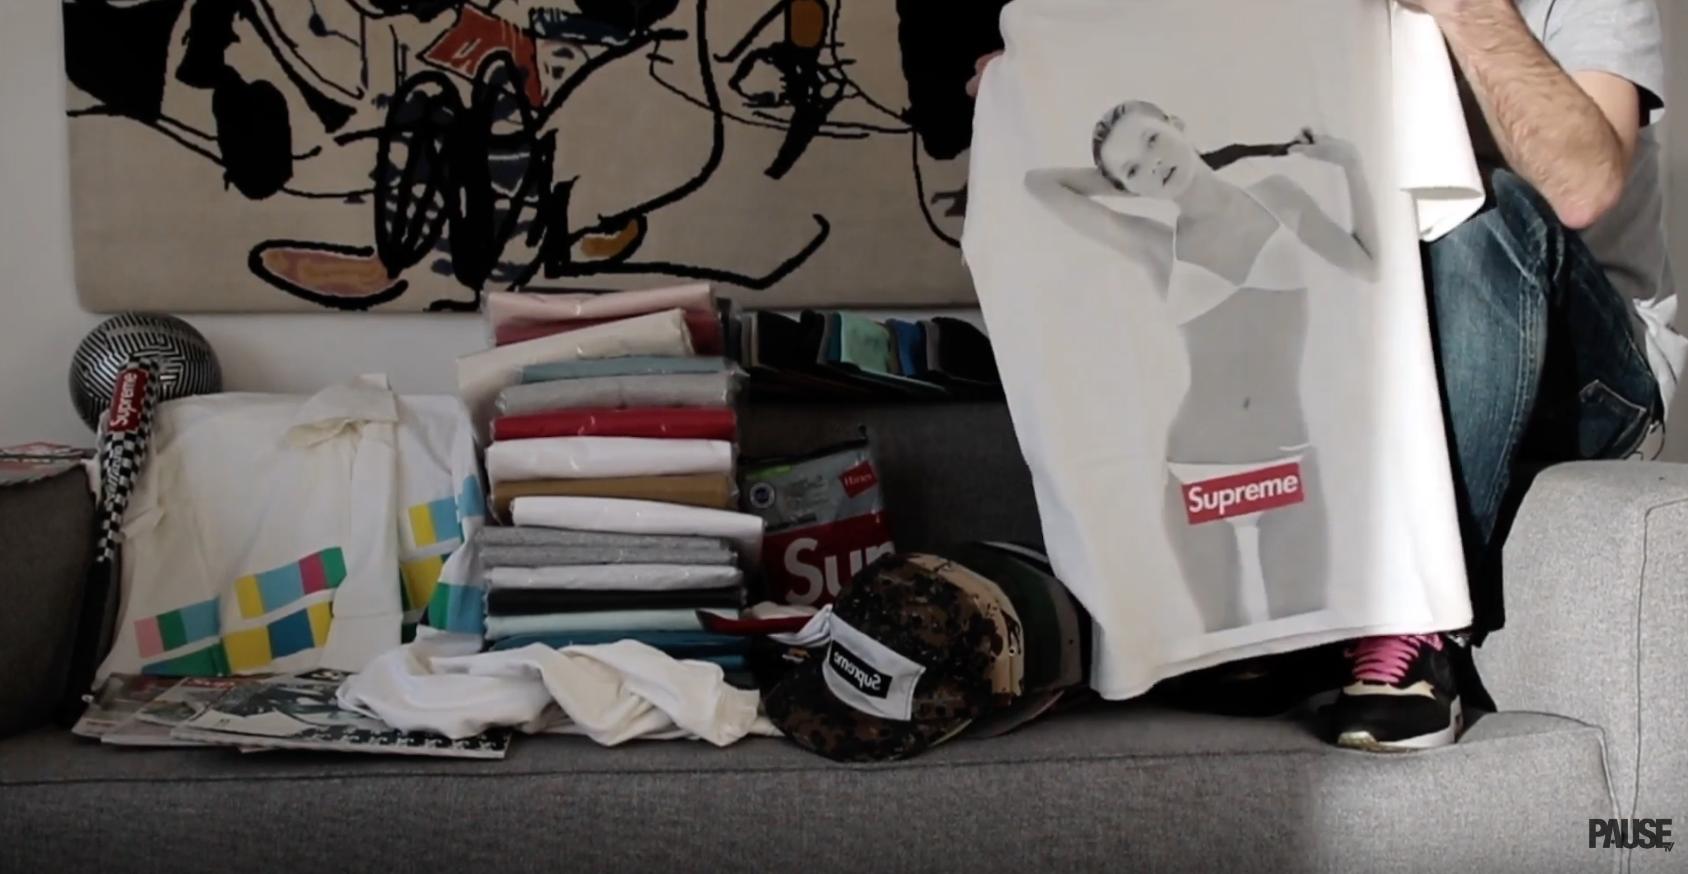 VIDEO: Supreme Collector Hates Bogo's